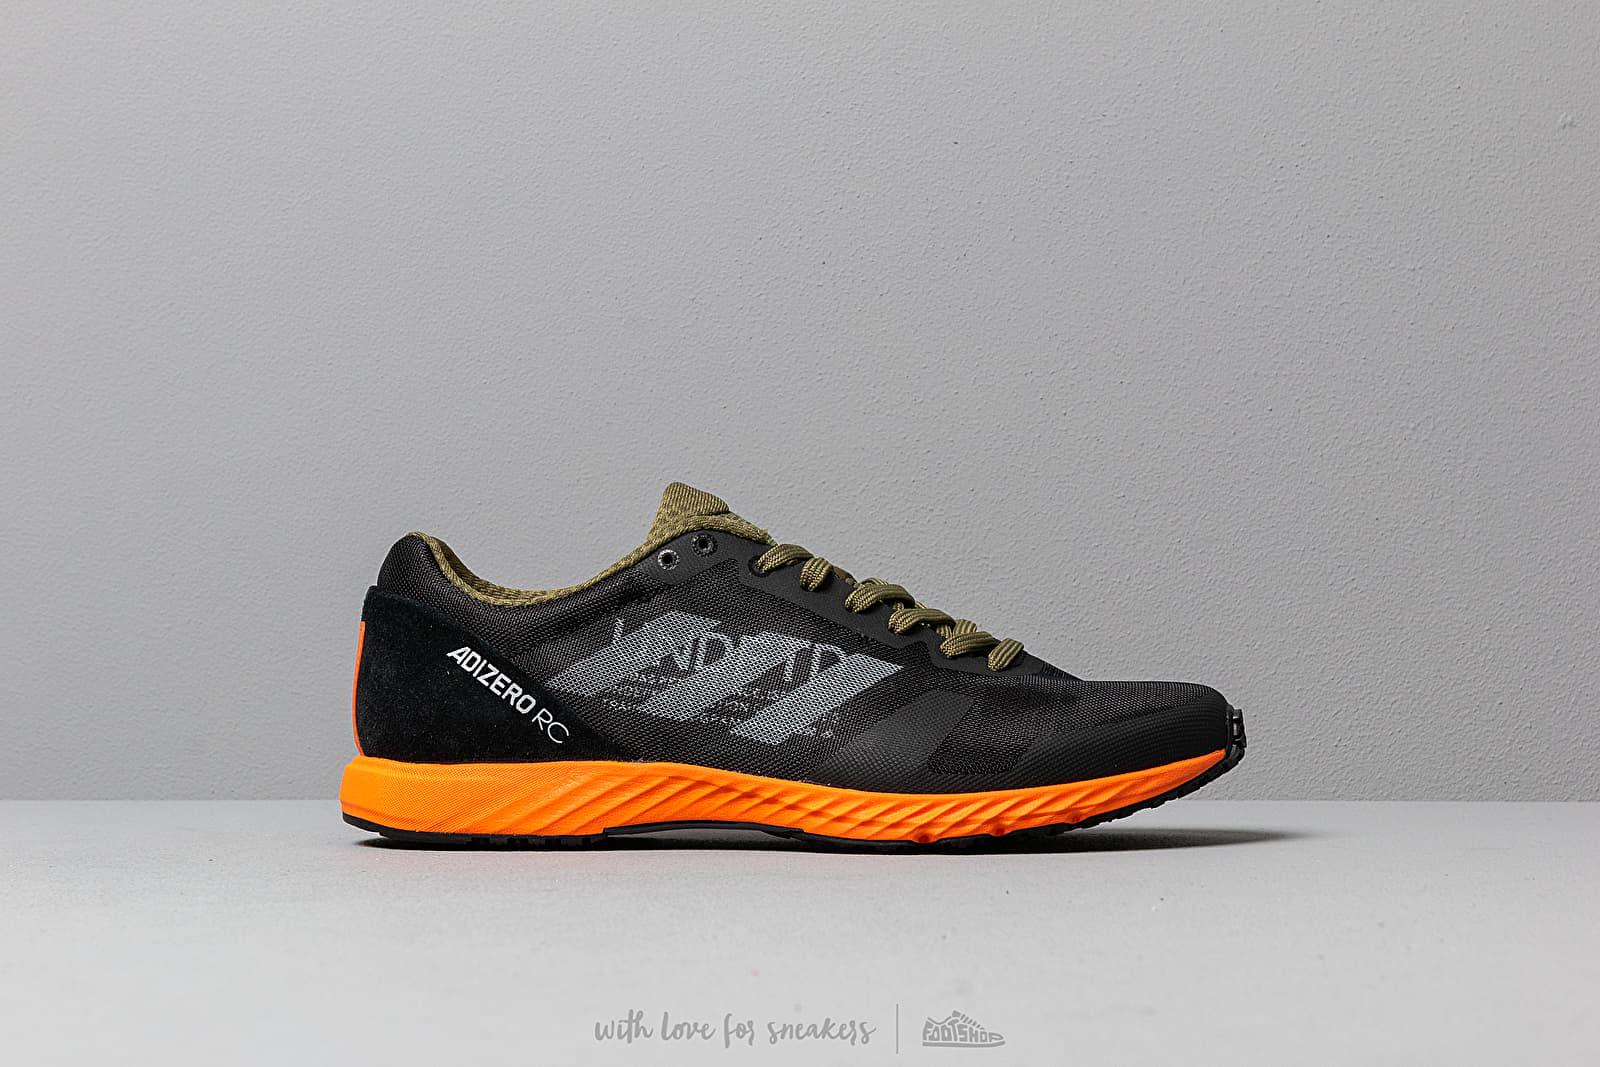 the best attitude 8e94d bf52b adidas x Undefeated Adizero RC Black-White  Light Grey Heather  Orange at a